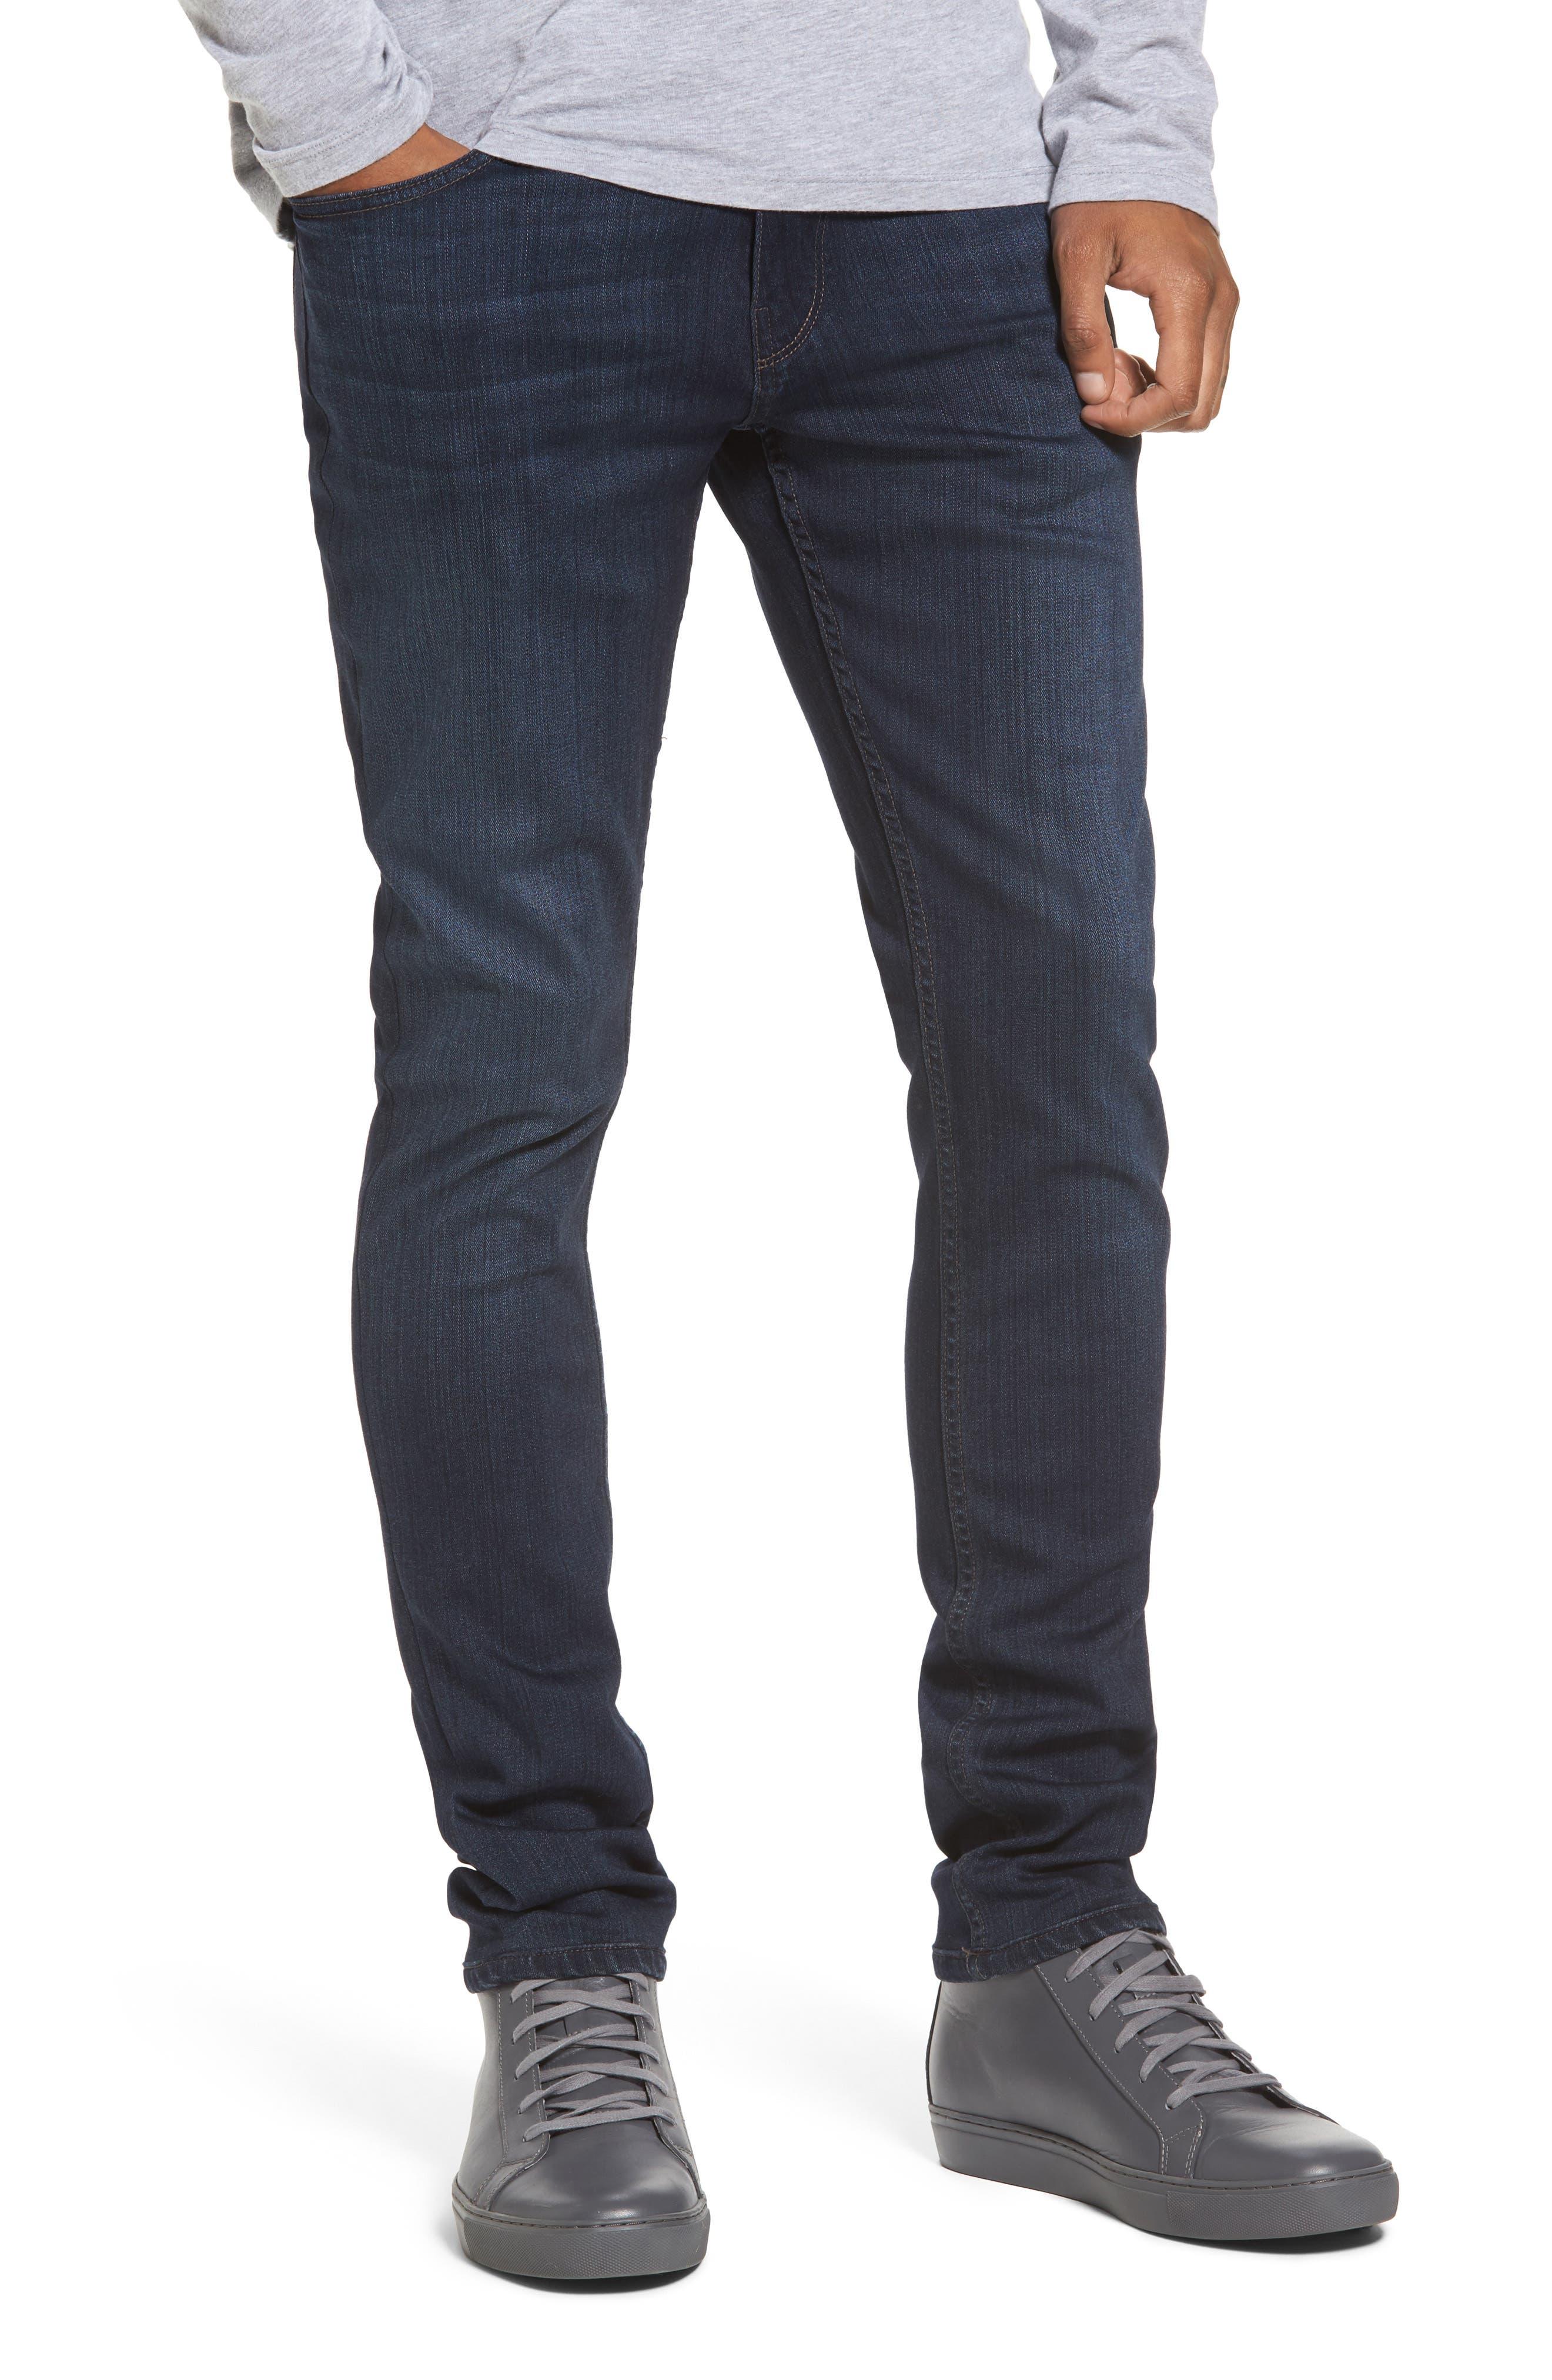 Transcend - Croft Skinny Fit Jeans,                         Main,                         color, Barron